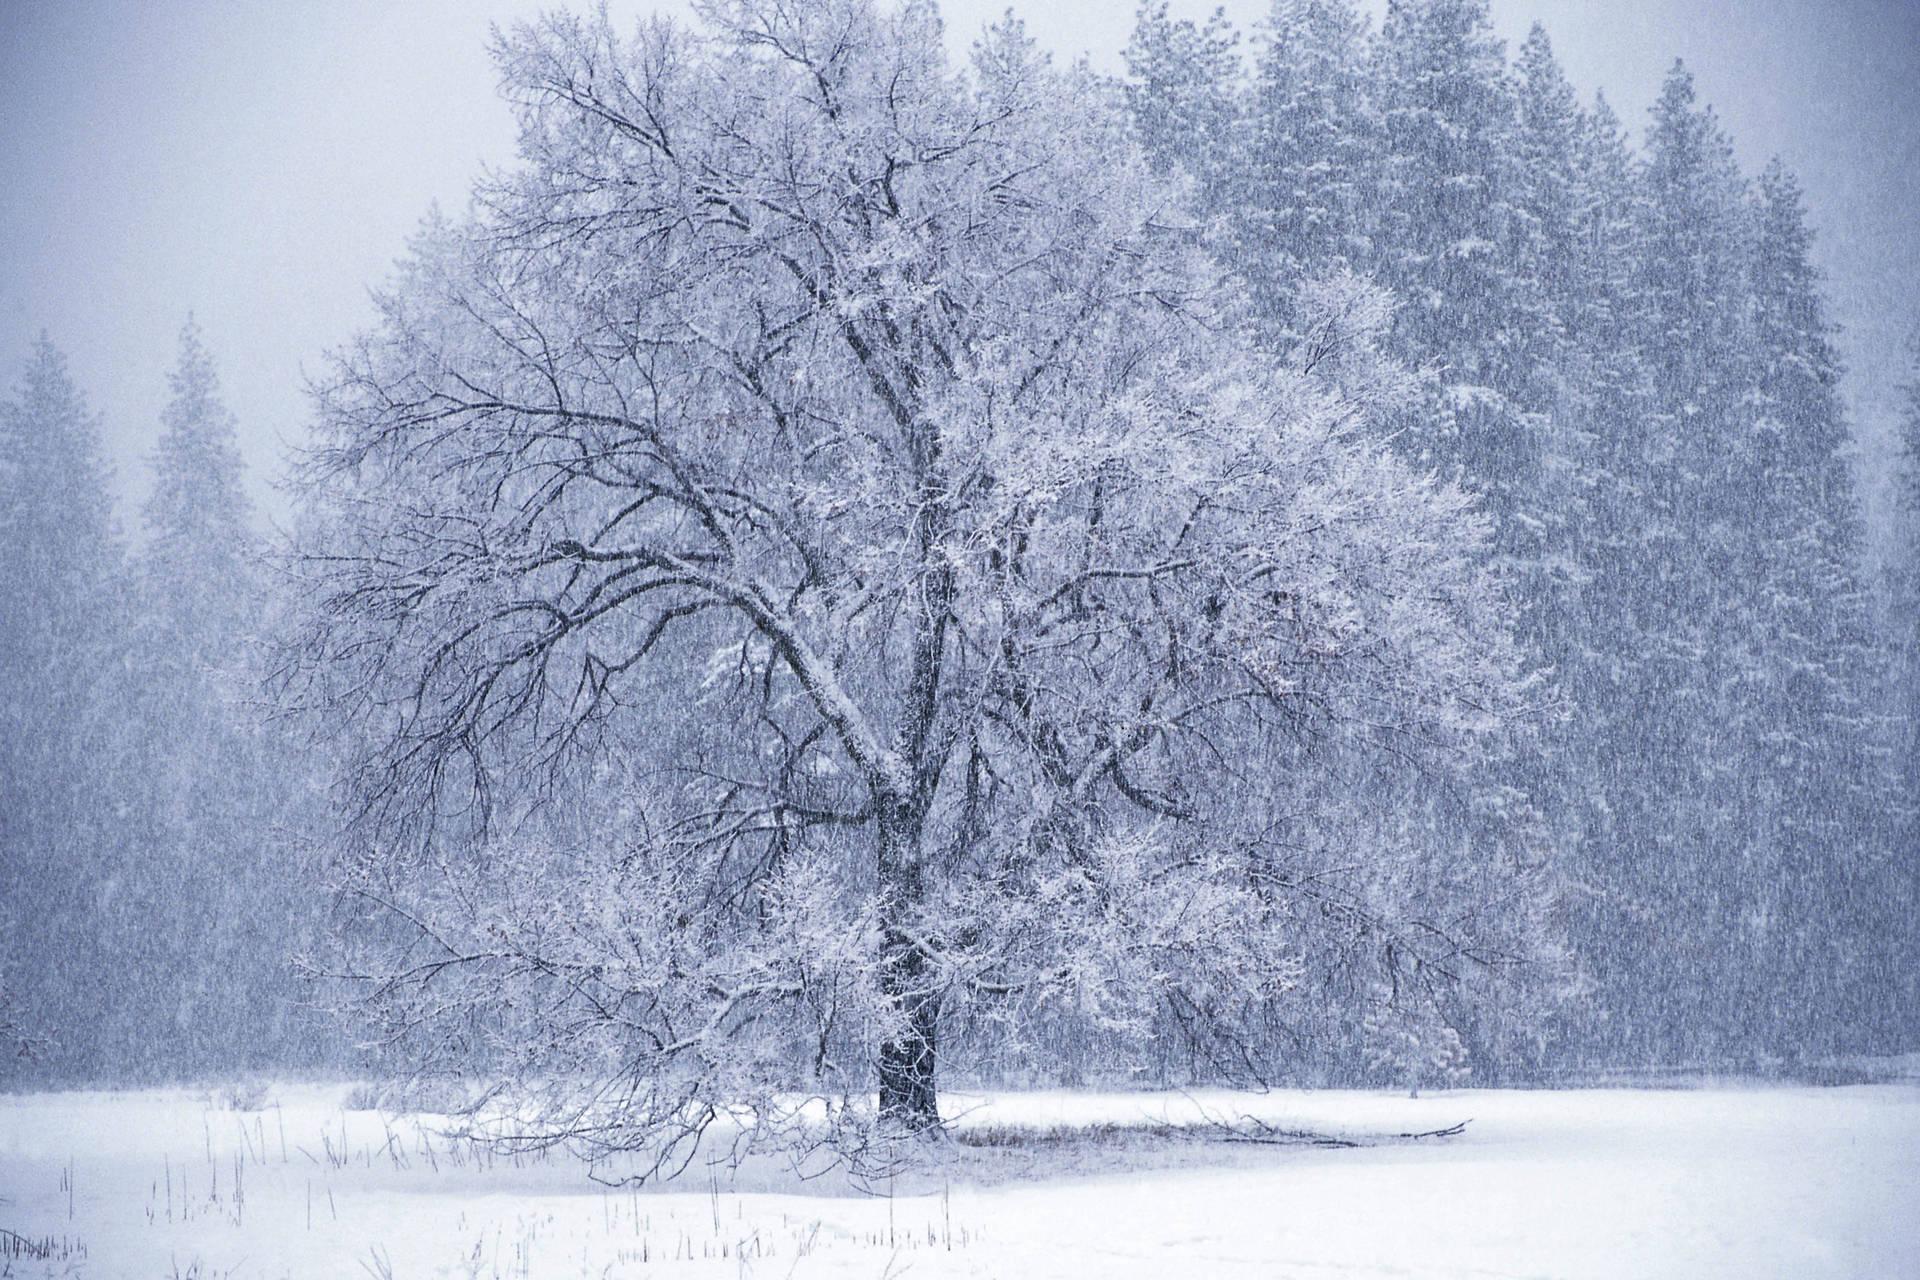 Winter tree snow storm Wallpaper 1444369814 1920x1280